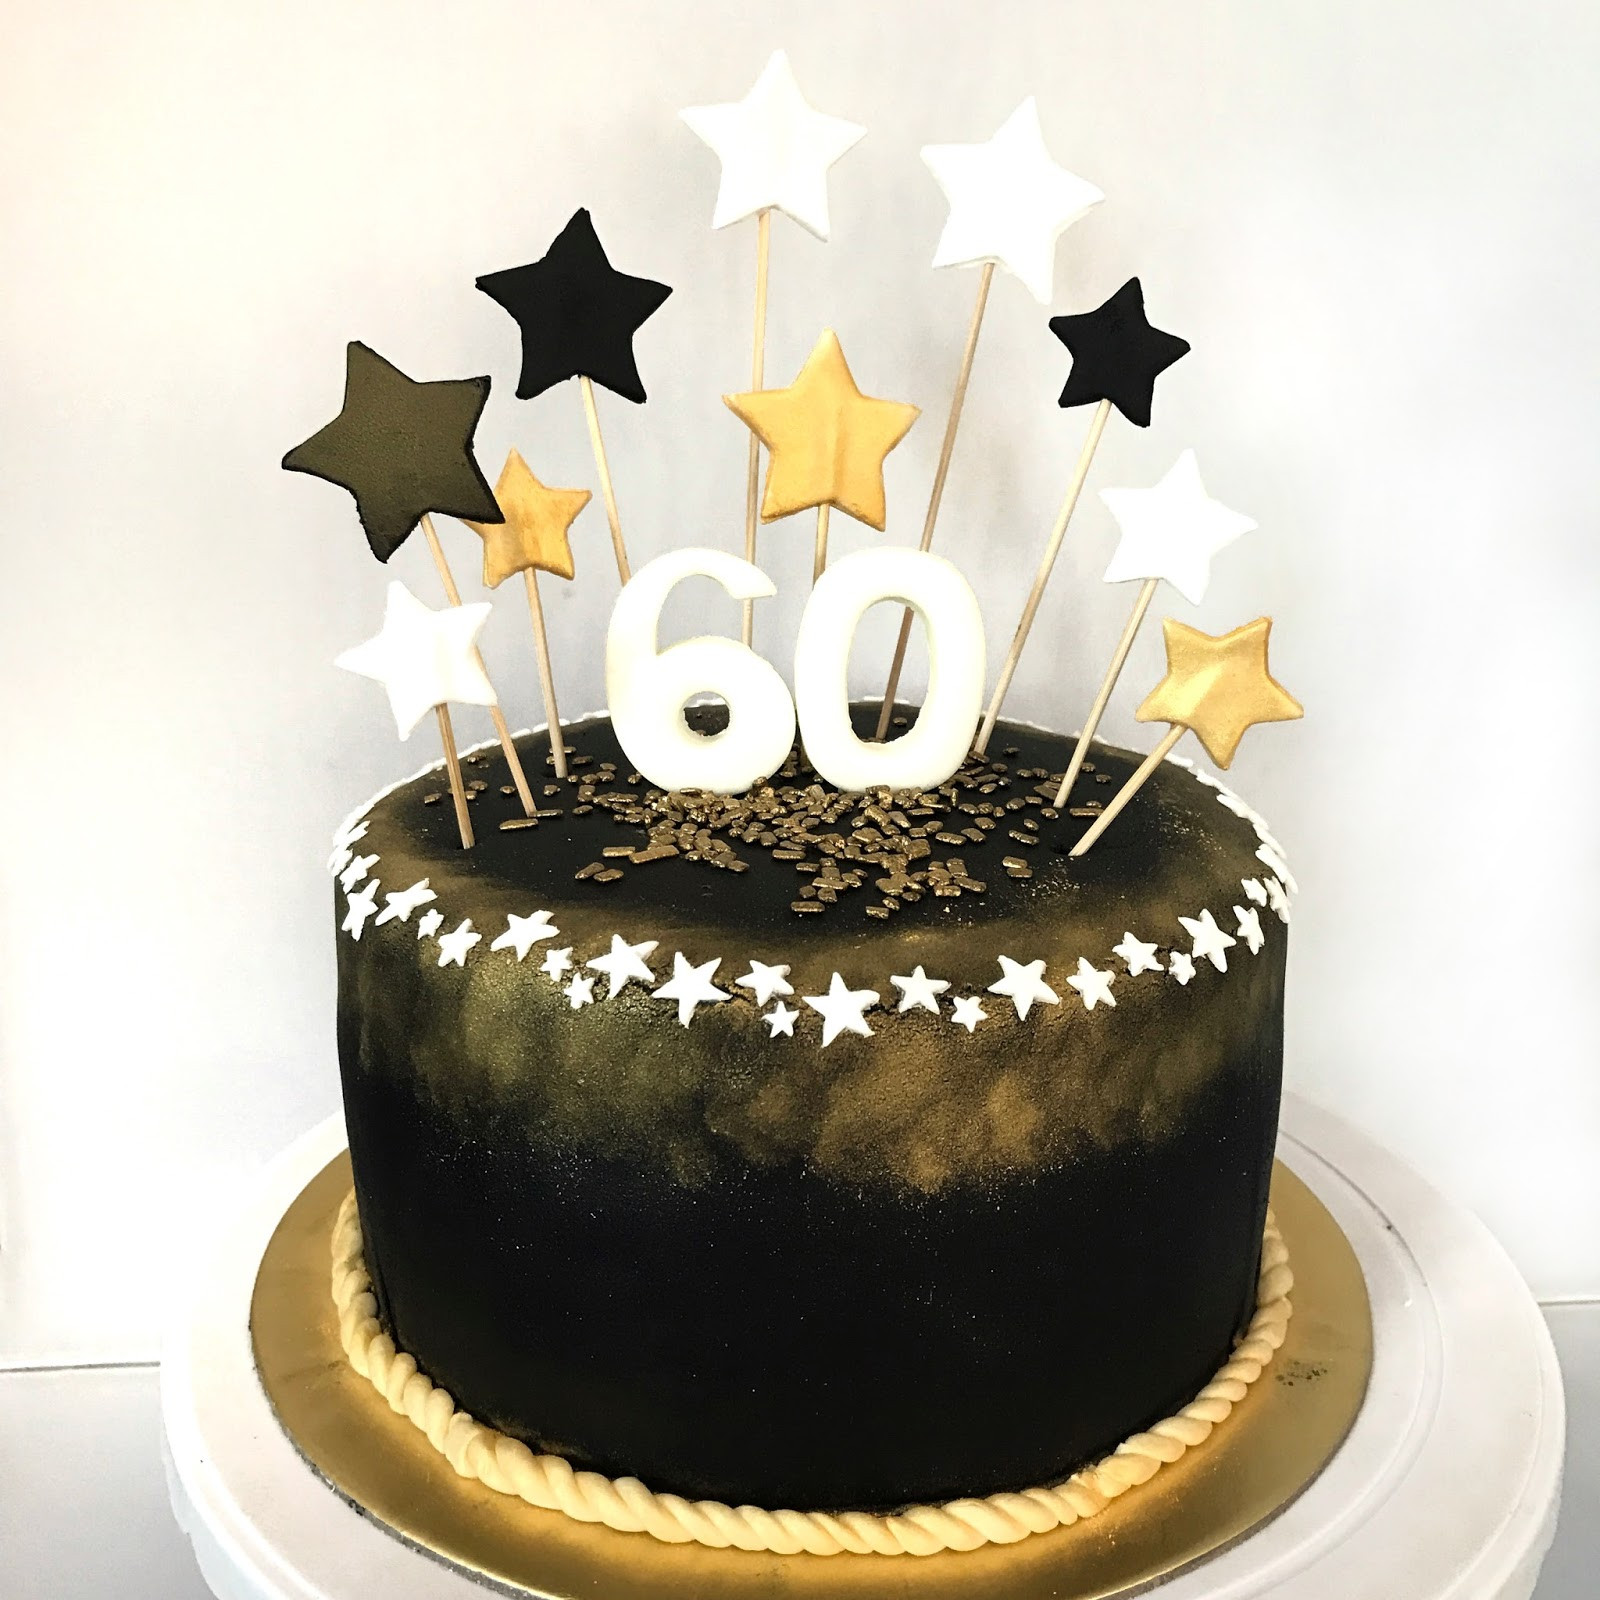 60th Birthday Cake Ideas  Black and Gold 60th Birthday Cake Sherbakes